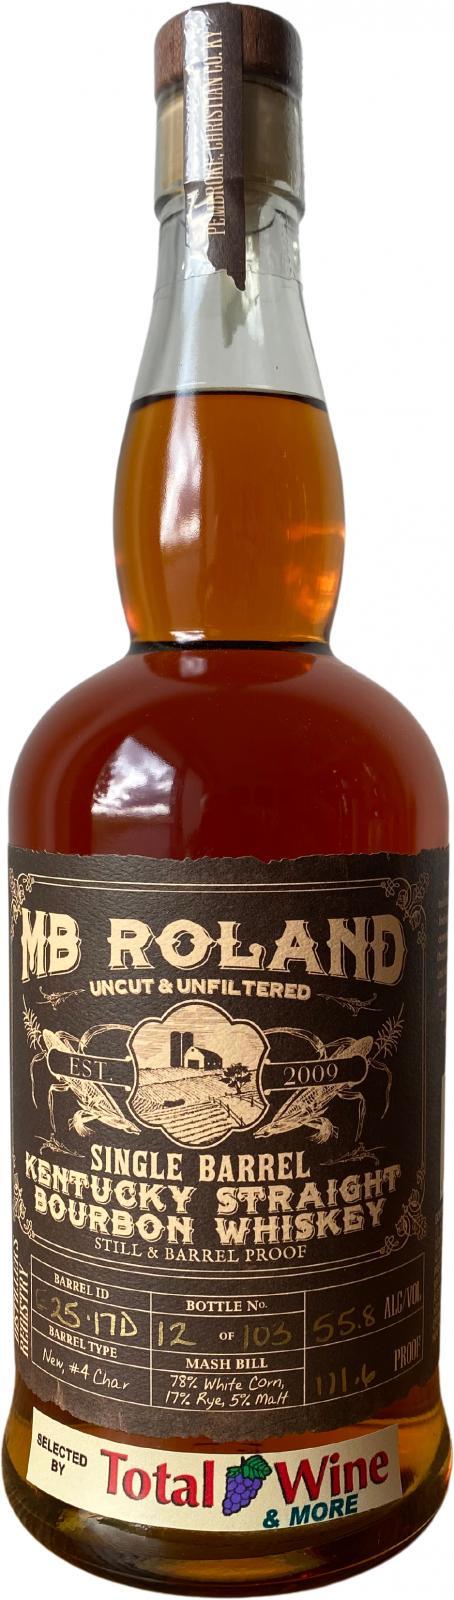 MB Roland Single Barrel Bourbon